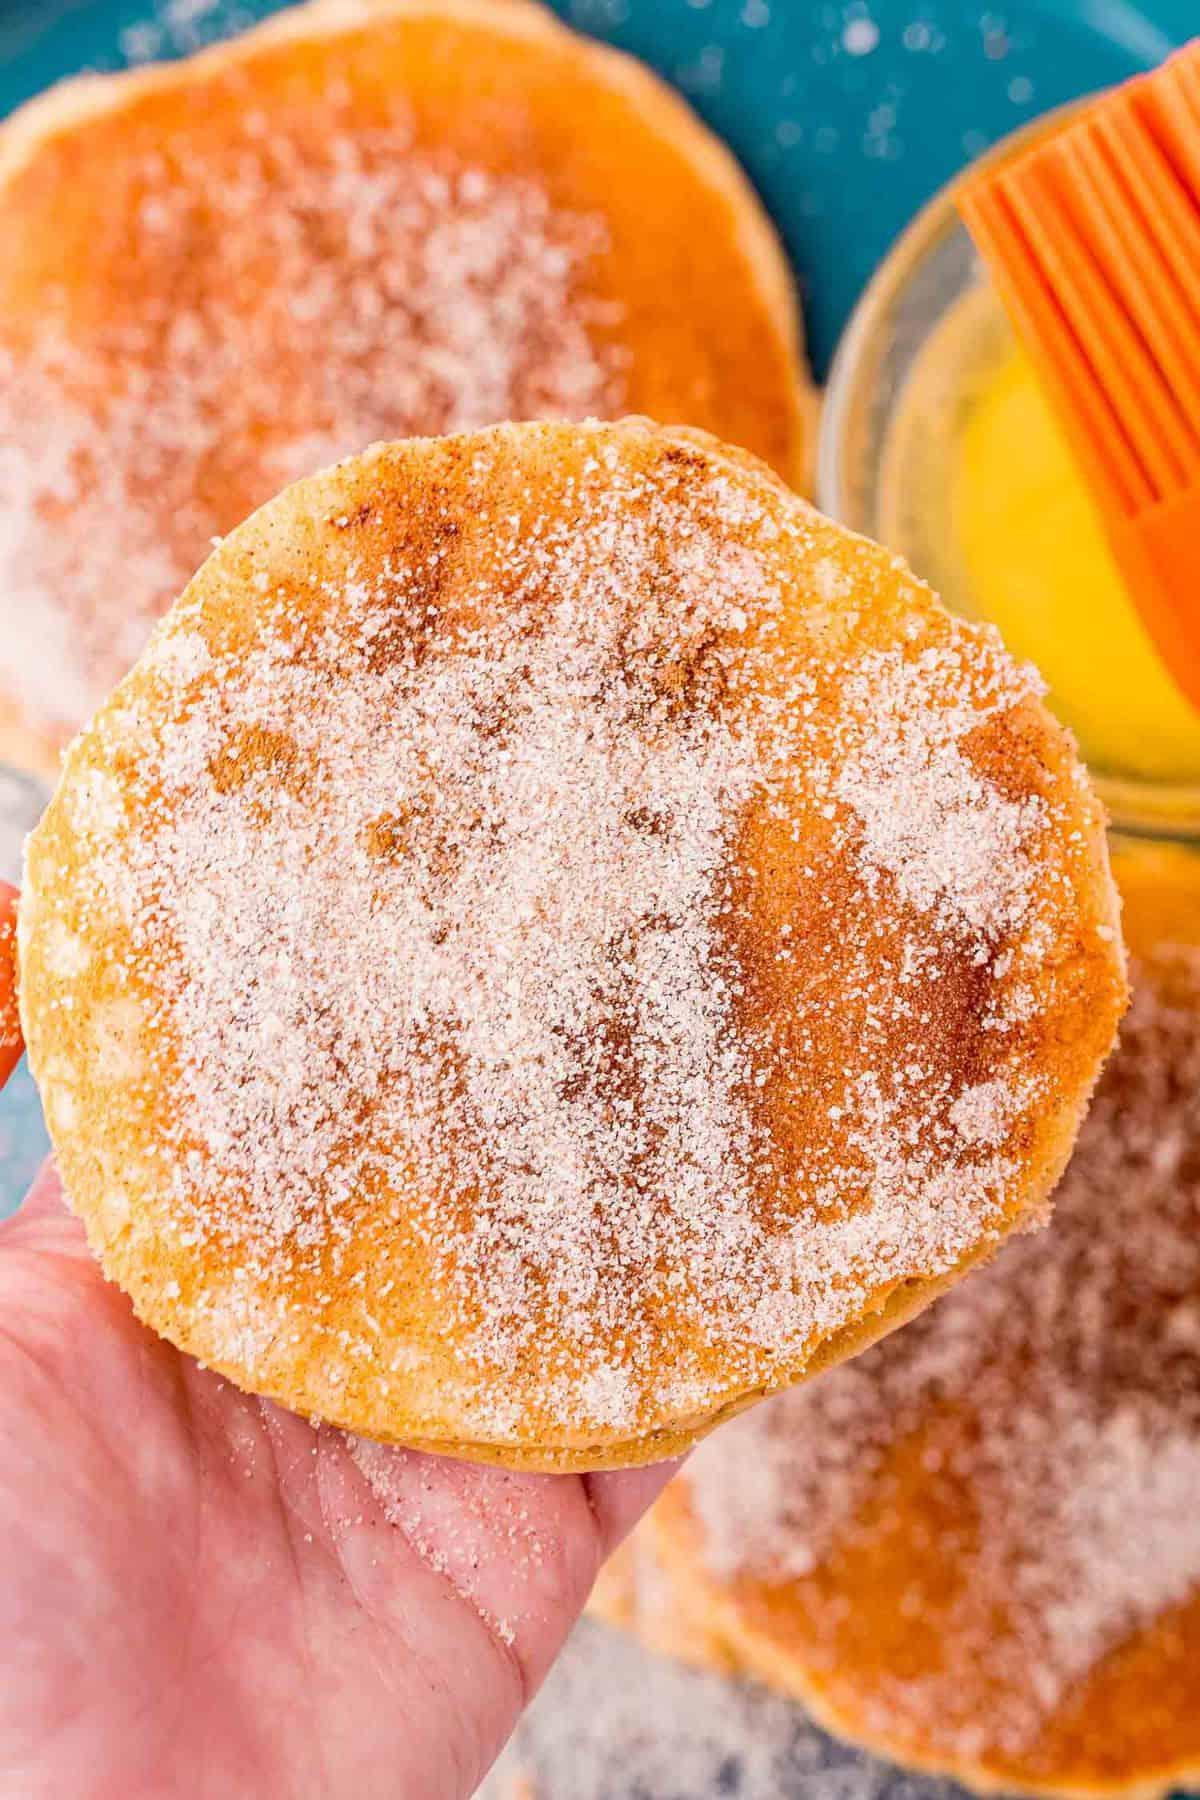 Pancake coated in cinnamon sugar.